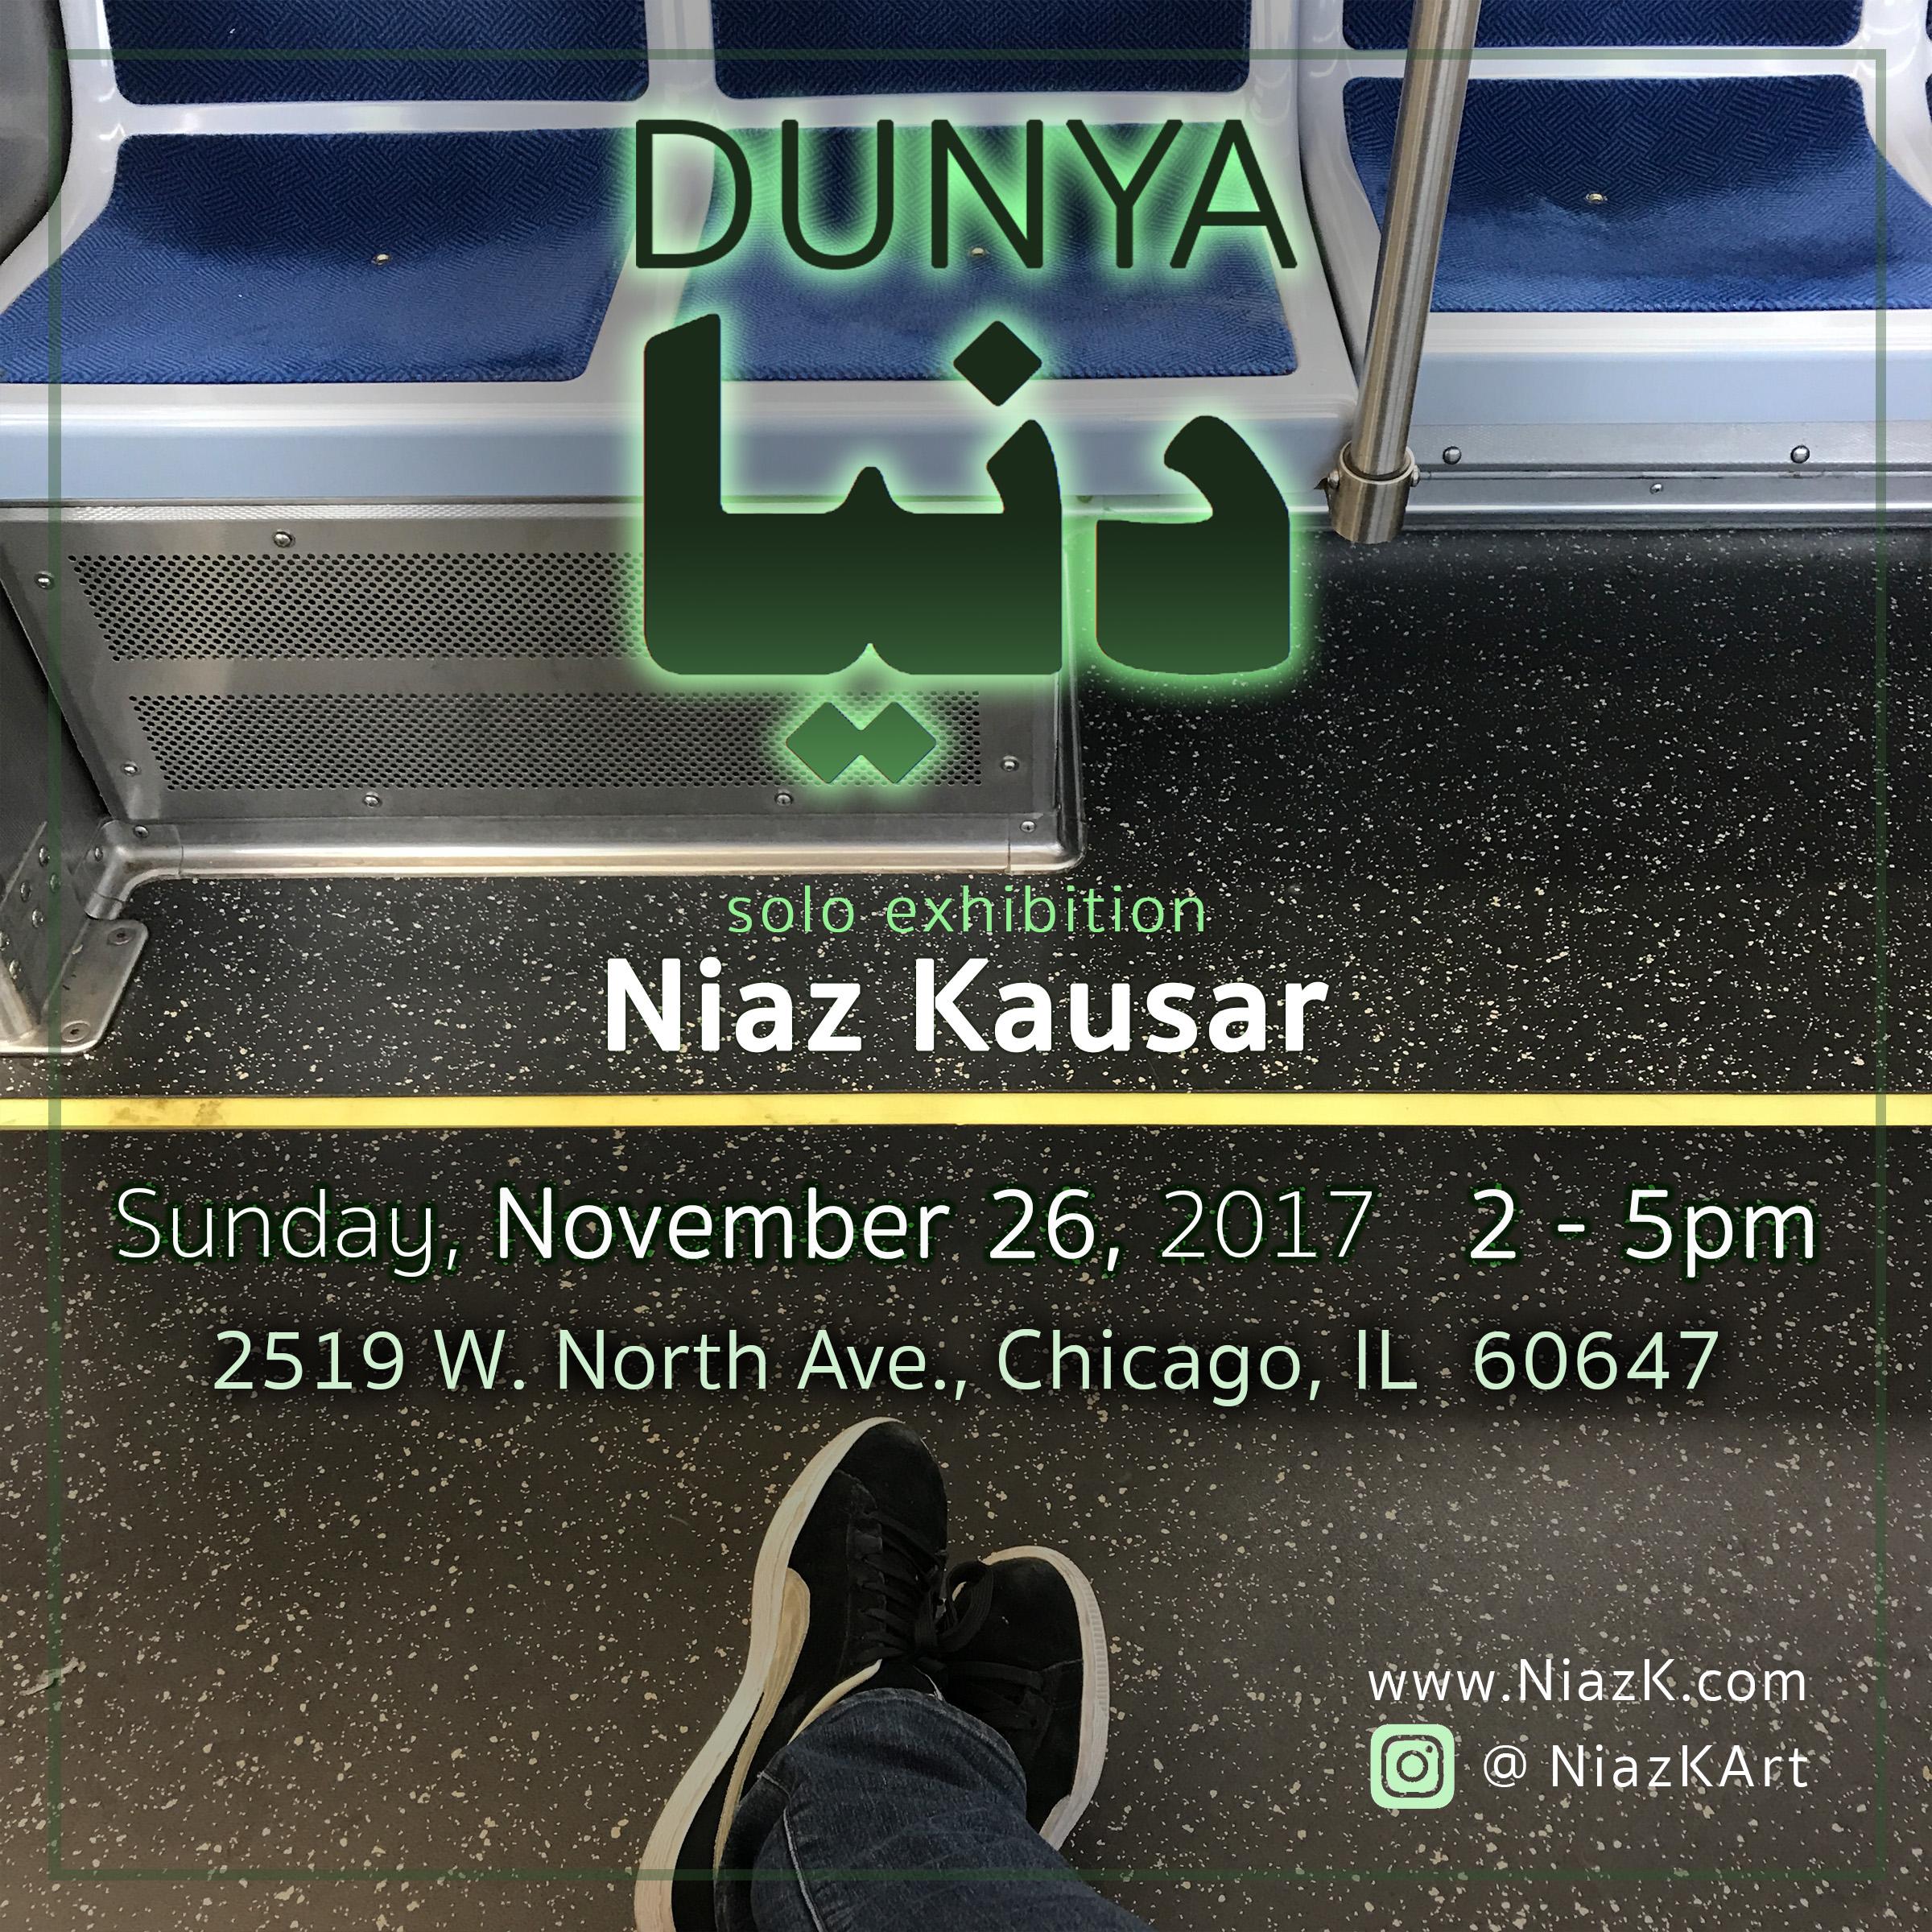 dunya train.jpg